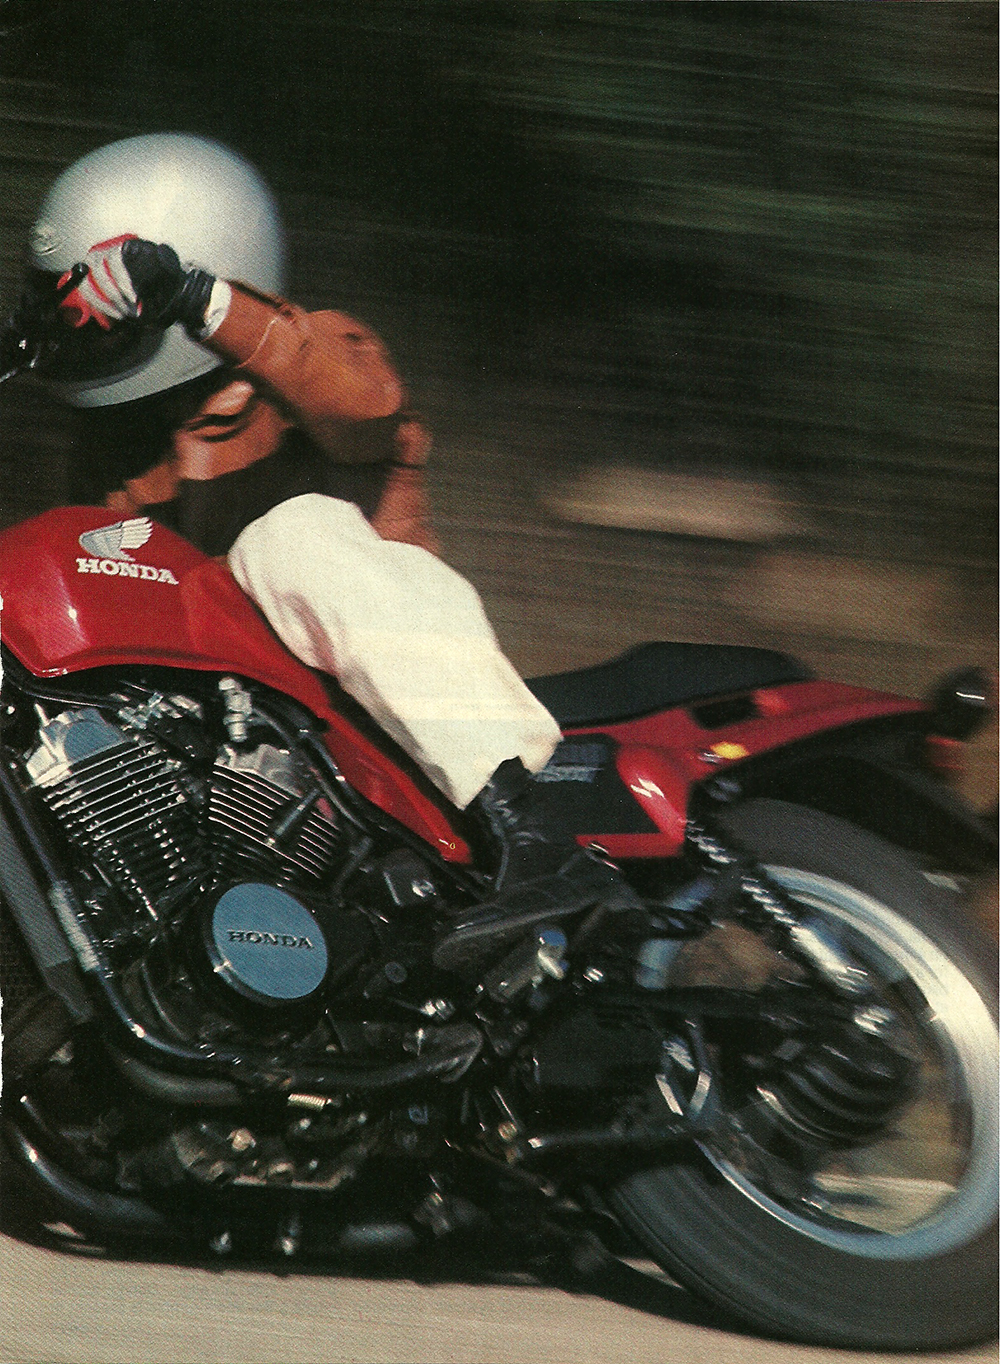 1983 Honda VT500 Ascot road test 2.jpg